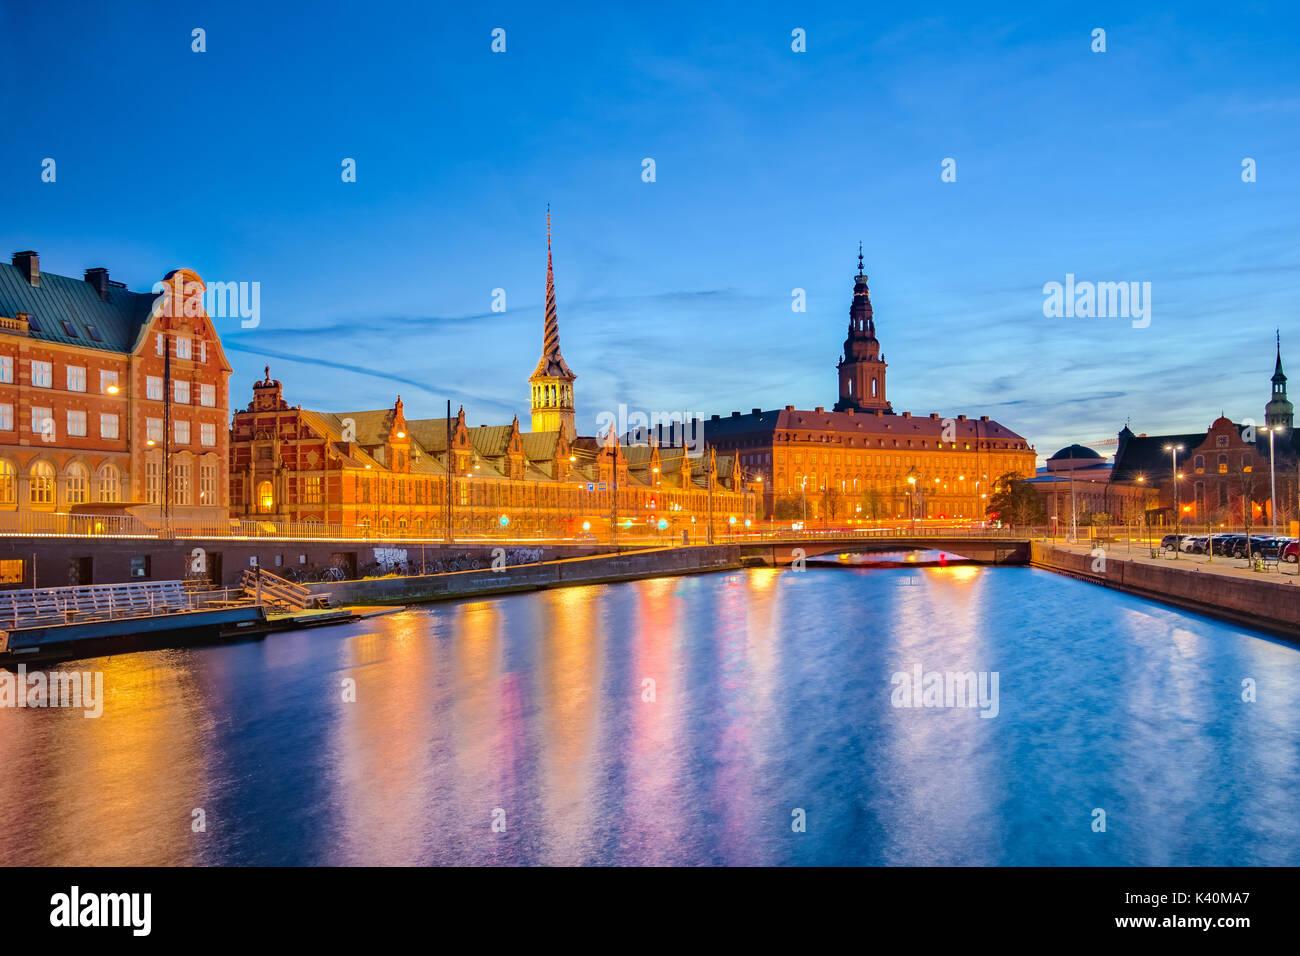 Copenhagen Cityscape with Christiansborg Palace at night in Copenhagen, Denmark. - Stock Image